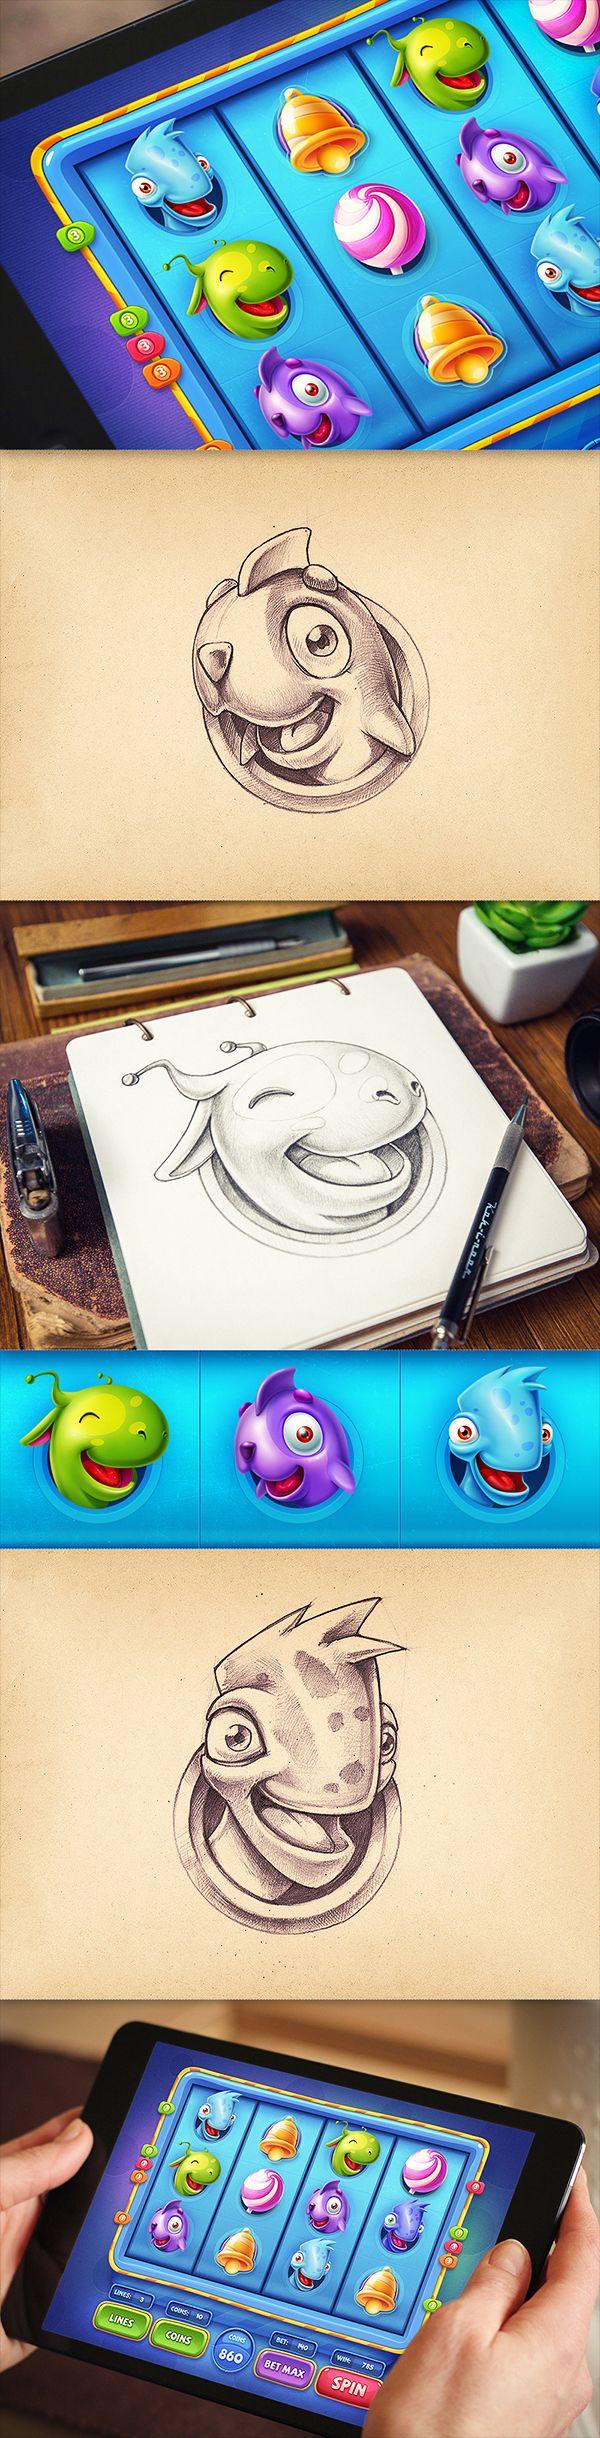 Incredible Works by Creative Mints   Abduzeedo Design Inspiration